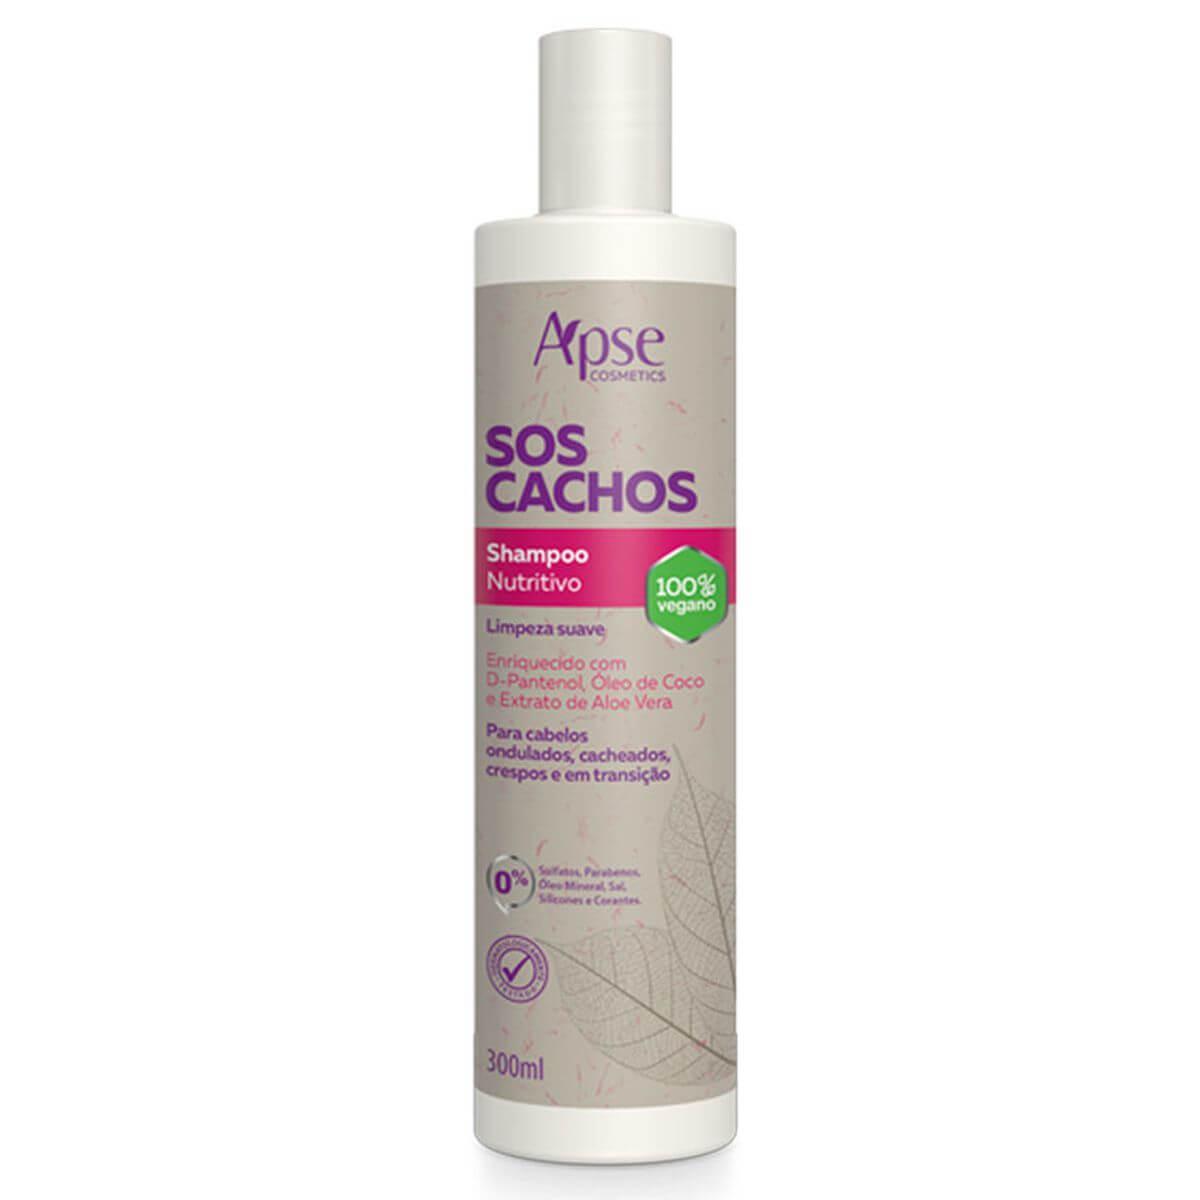 Apse - Shampoo Sos Cachos - 300ml